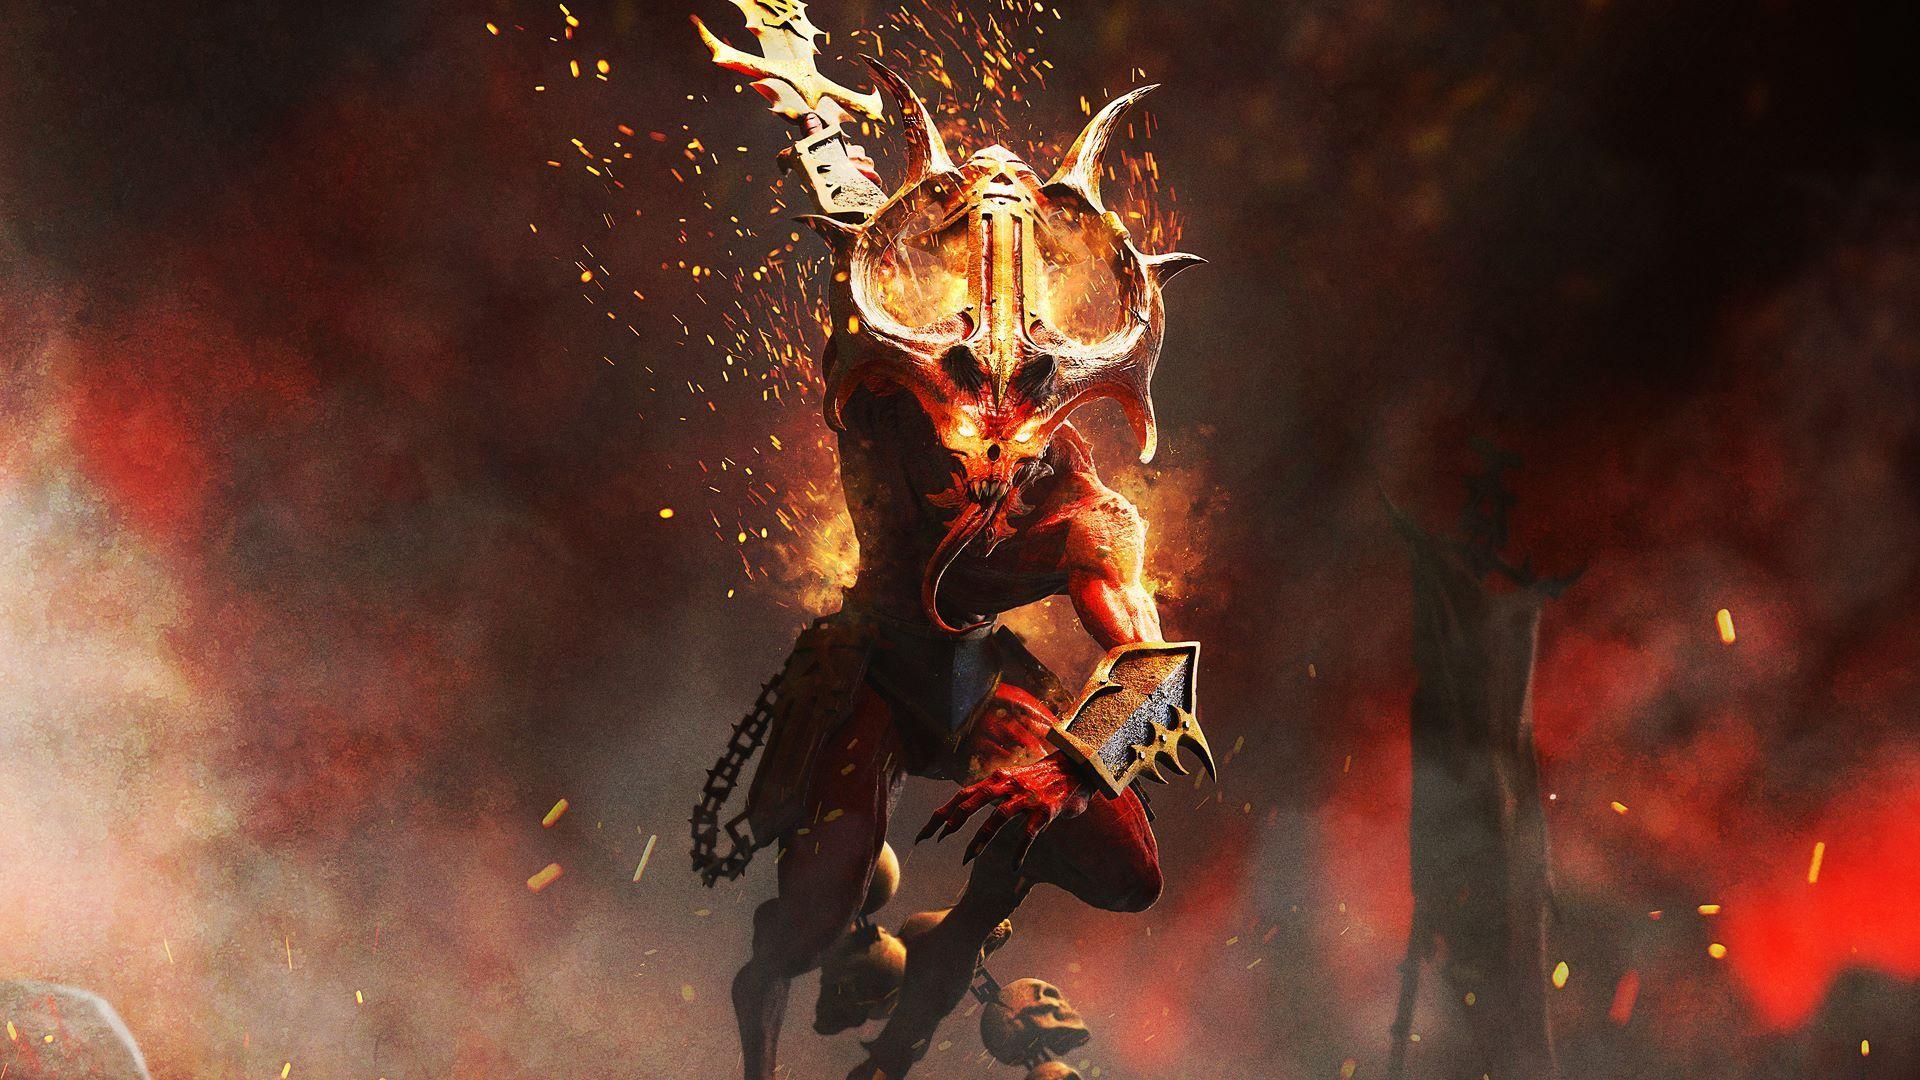 Vyšlo hack-n-slash rpg Warhammer Chaosbane